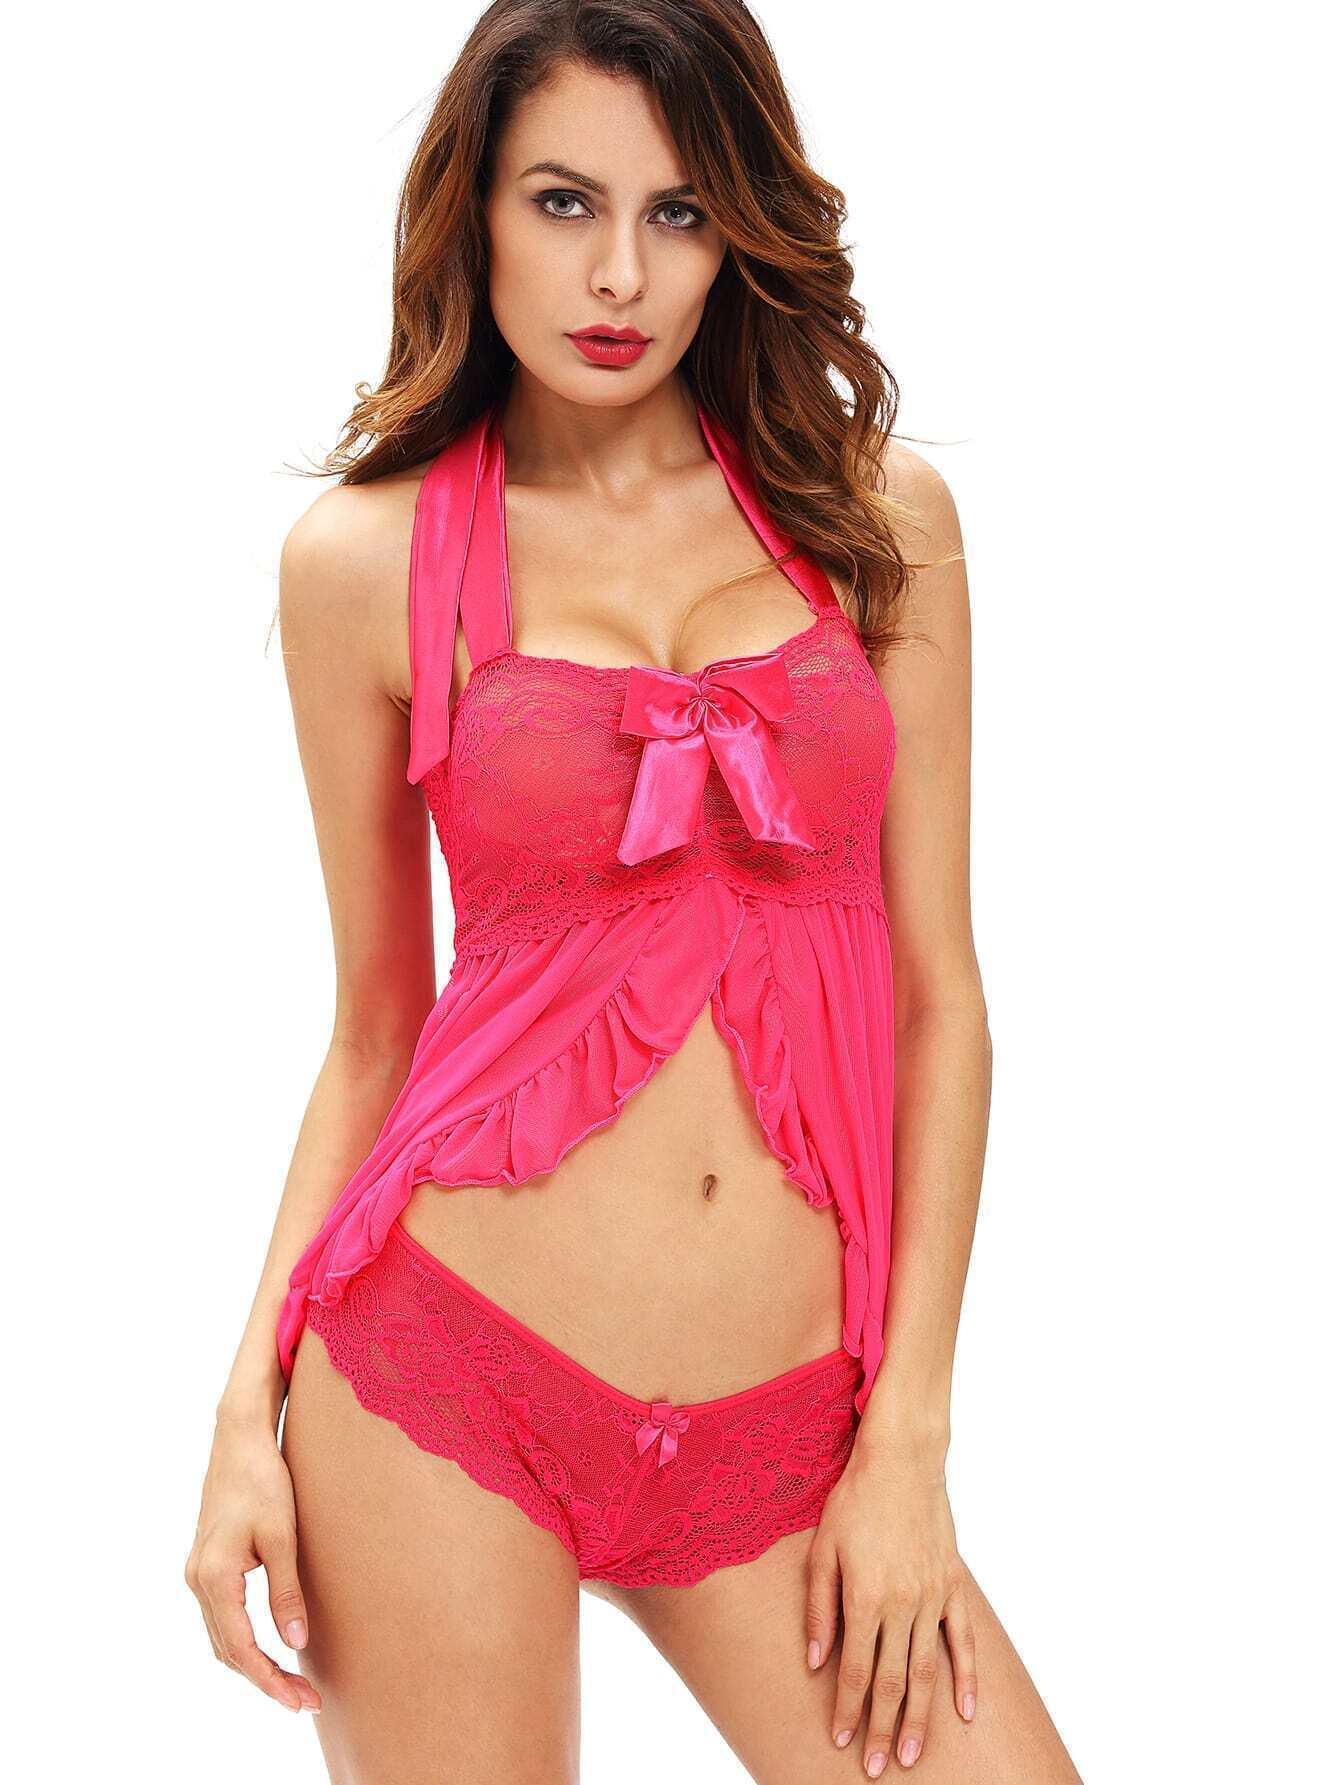 4fac2caf593b5 Pink Bow Detail Flounce Trim Lace Slip Dress EmmaCloth-Women Fast ...